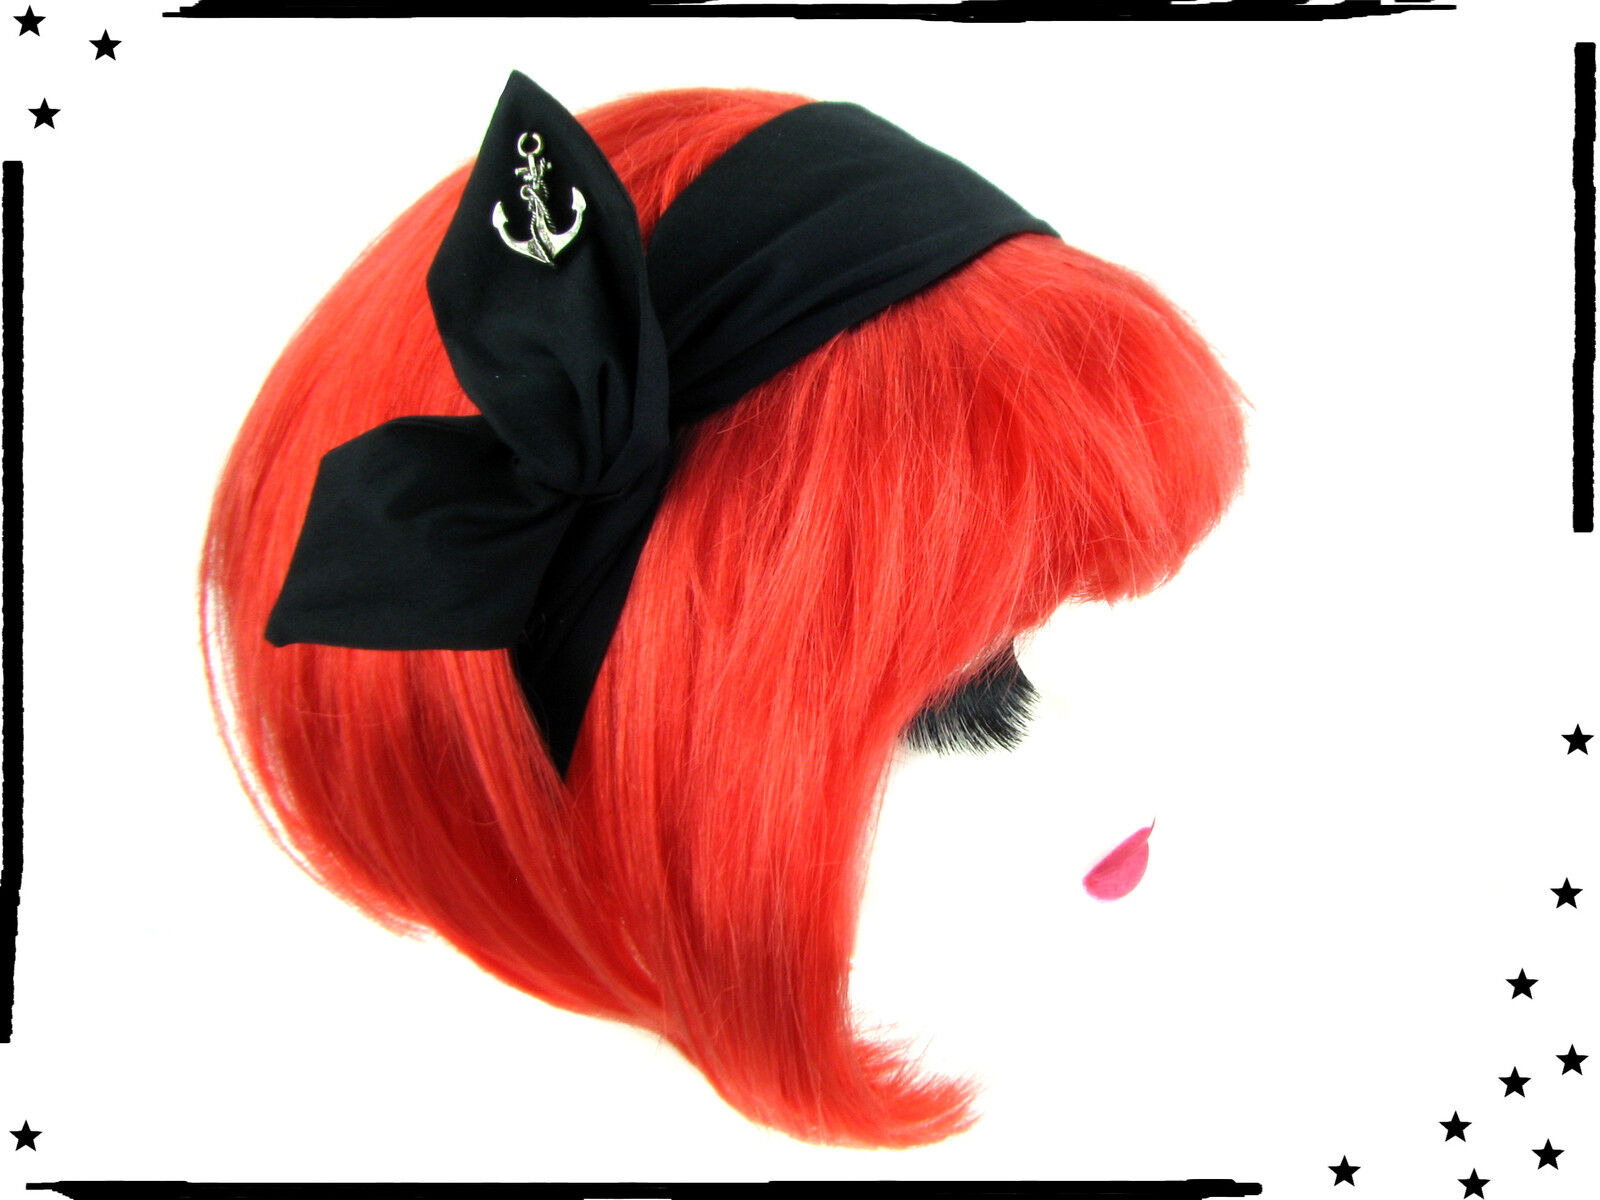 Draht Haarband uni schwarz mit Anker Rockabilly  Pin up Retro